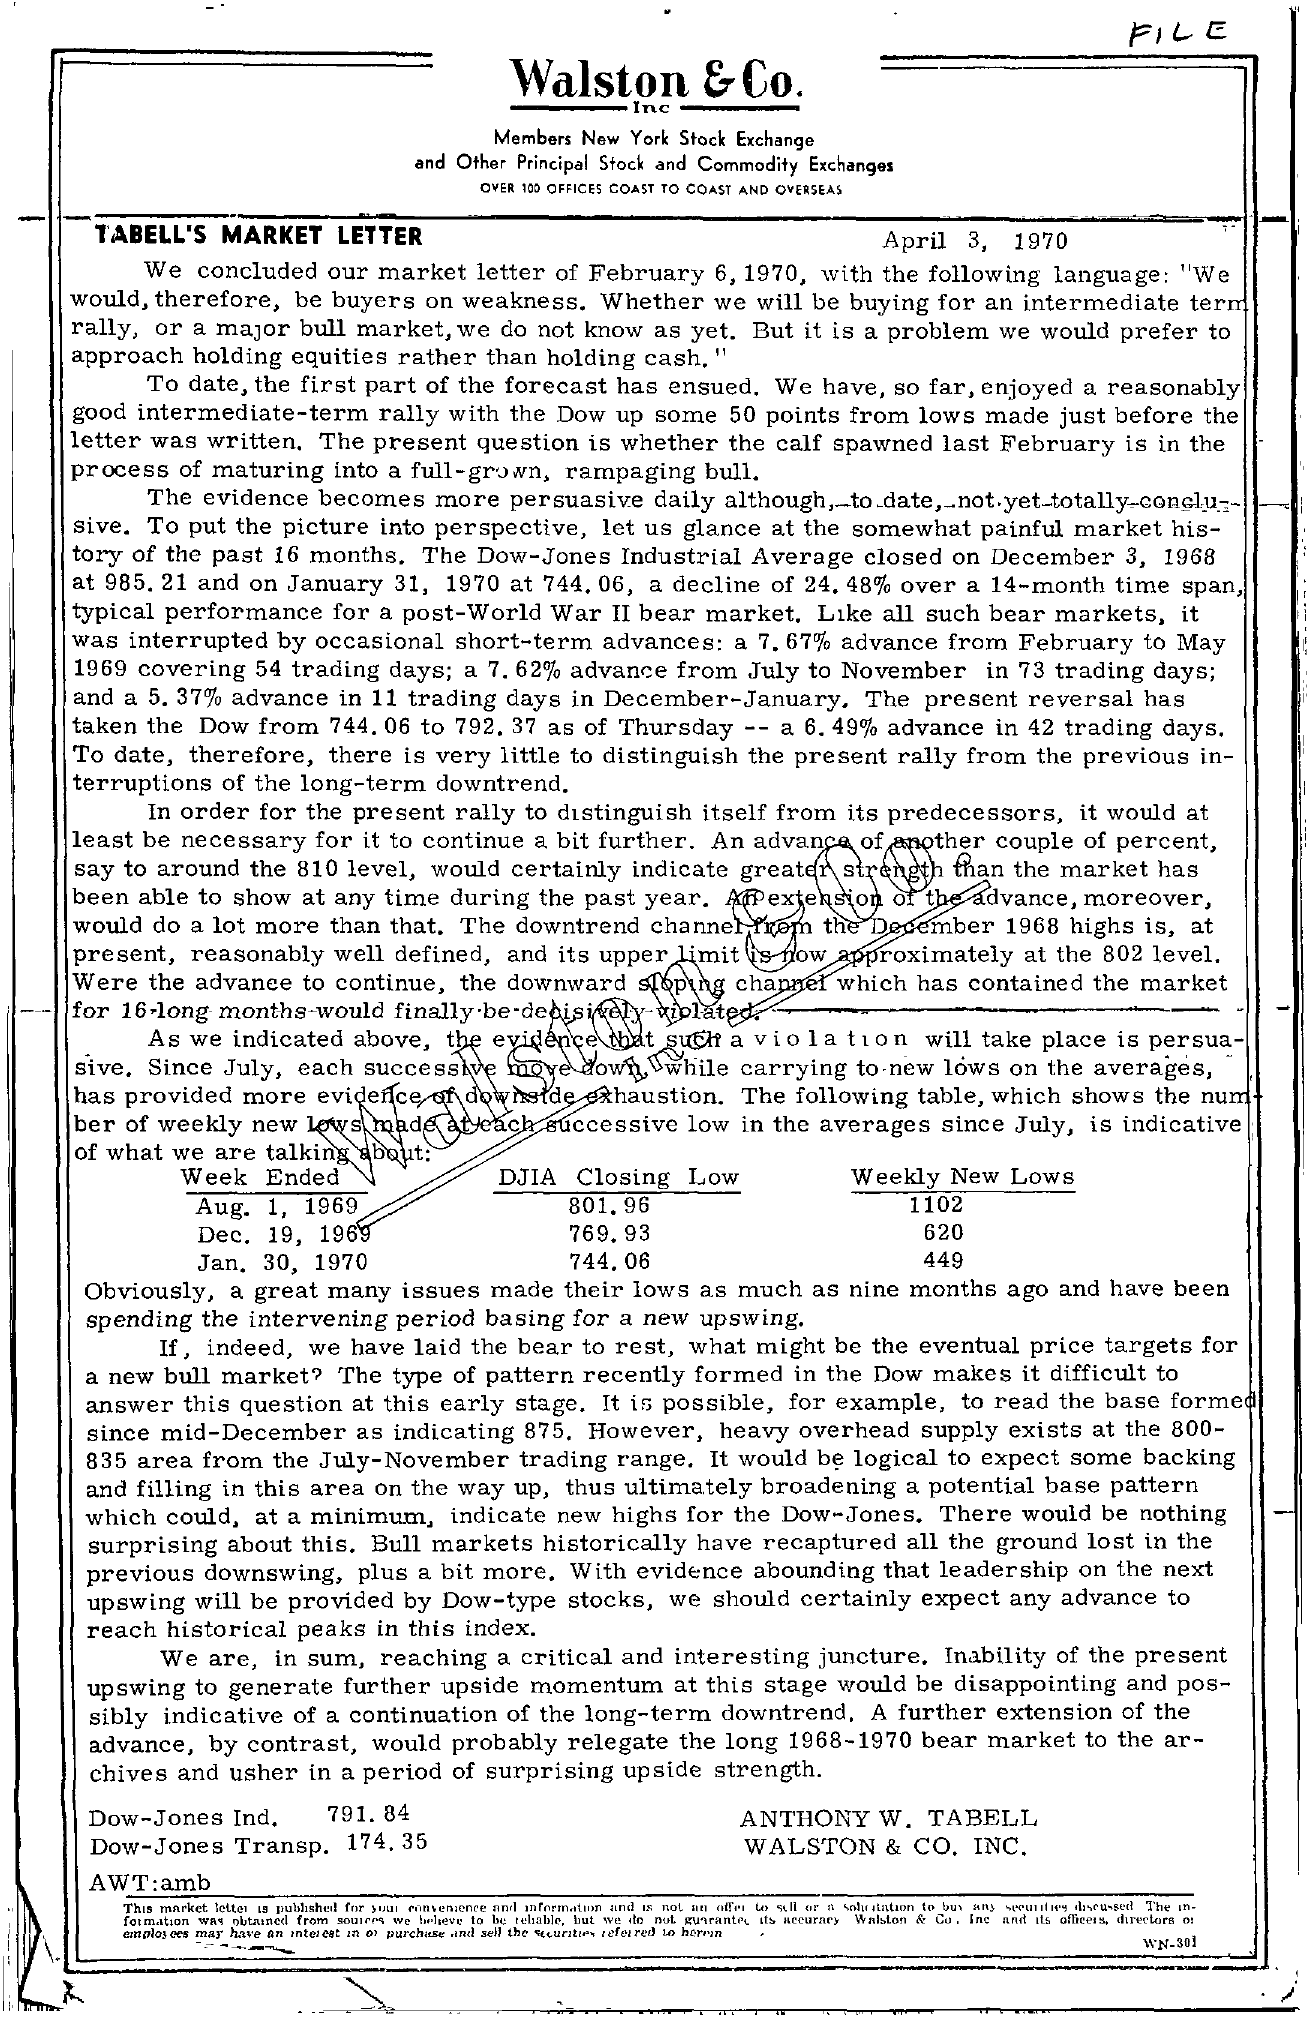 Tabell's Market Letter - April 03, 1970